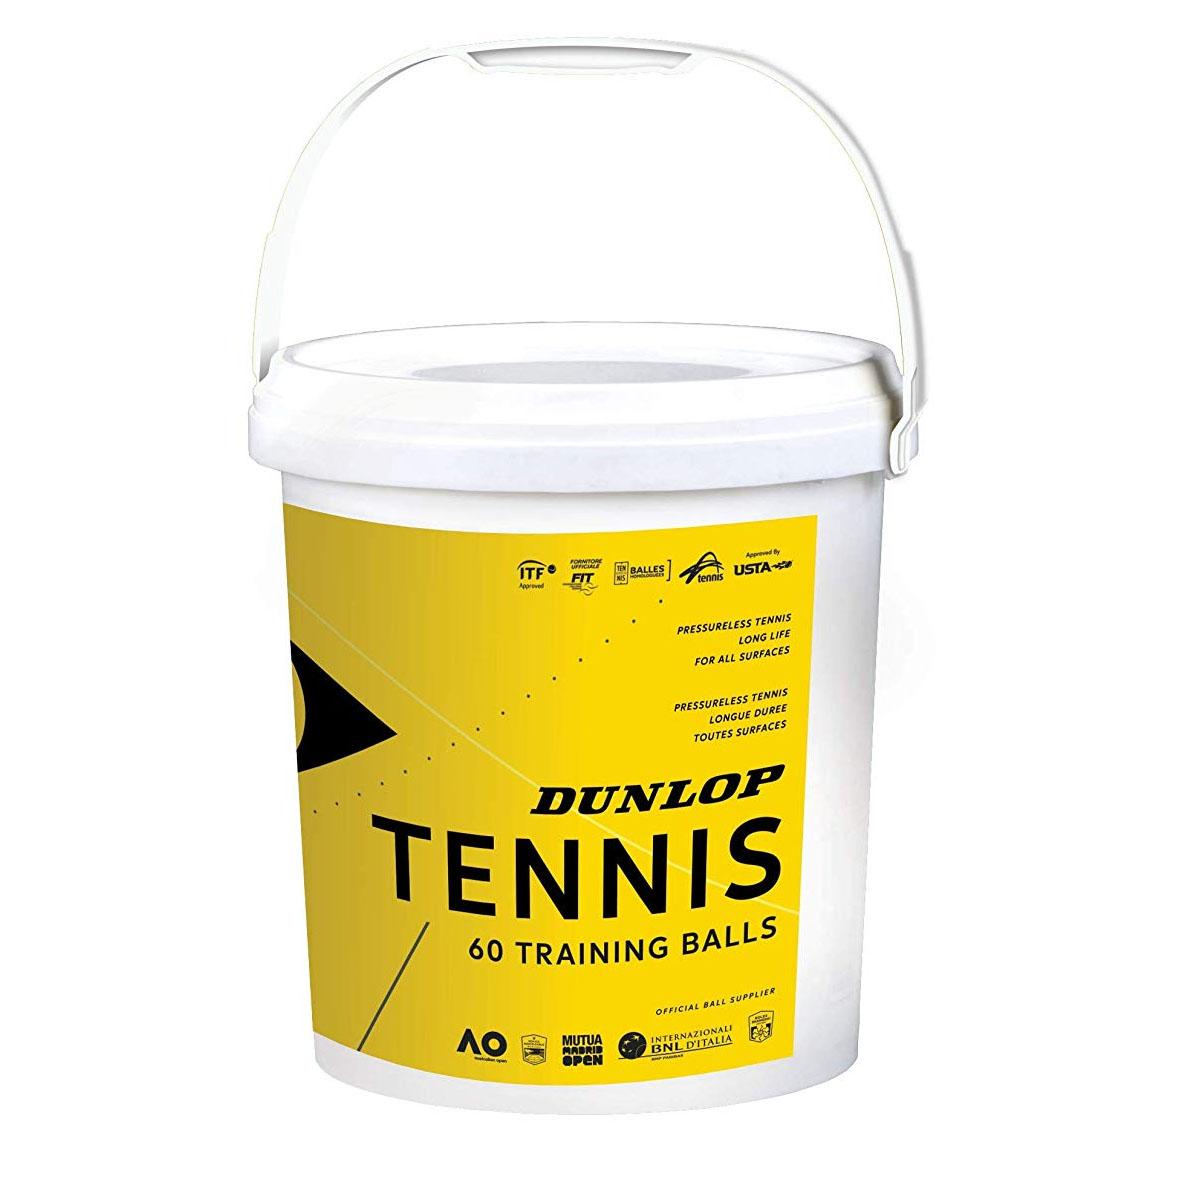 Image of Dunlop Training Tennis Bucket - 60 Balls